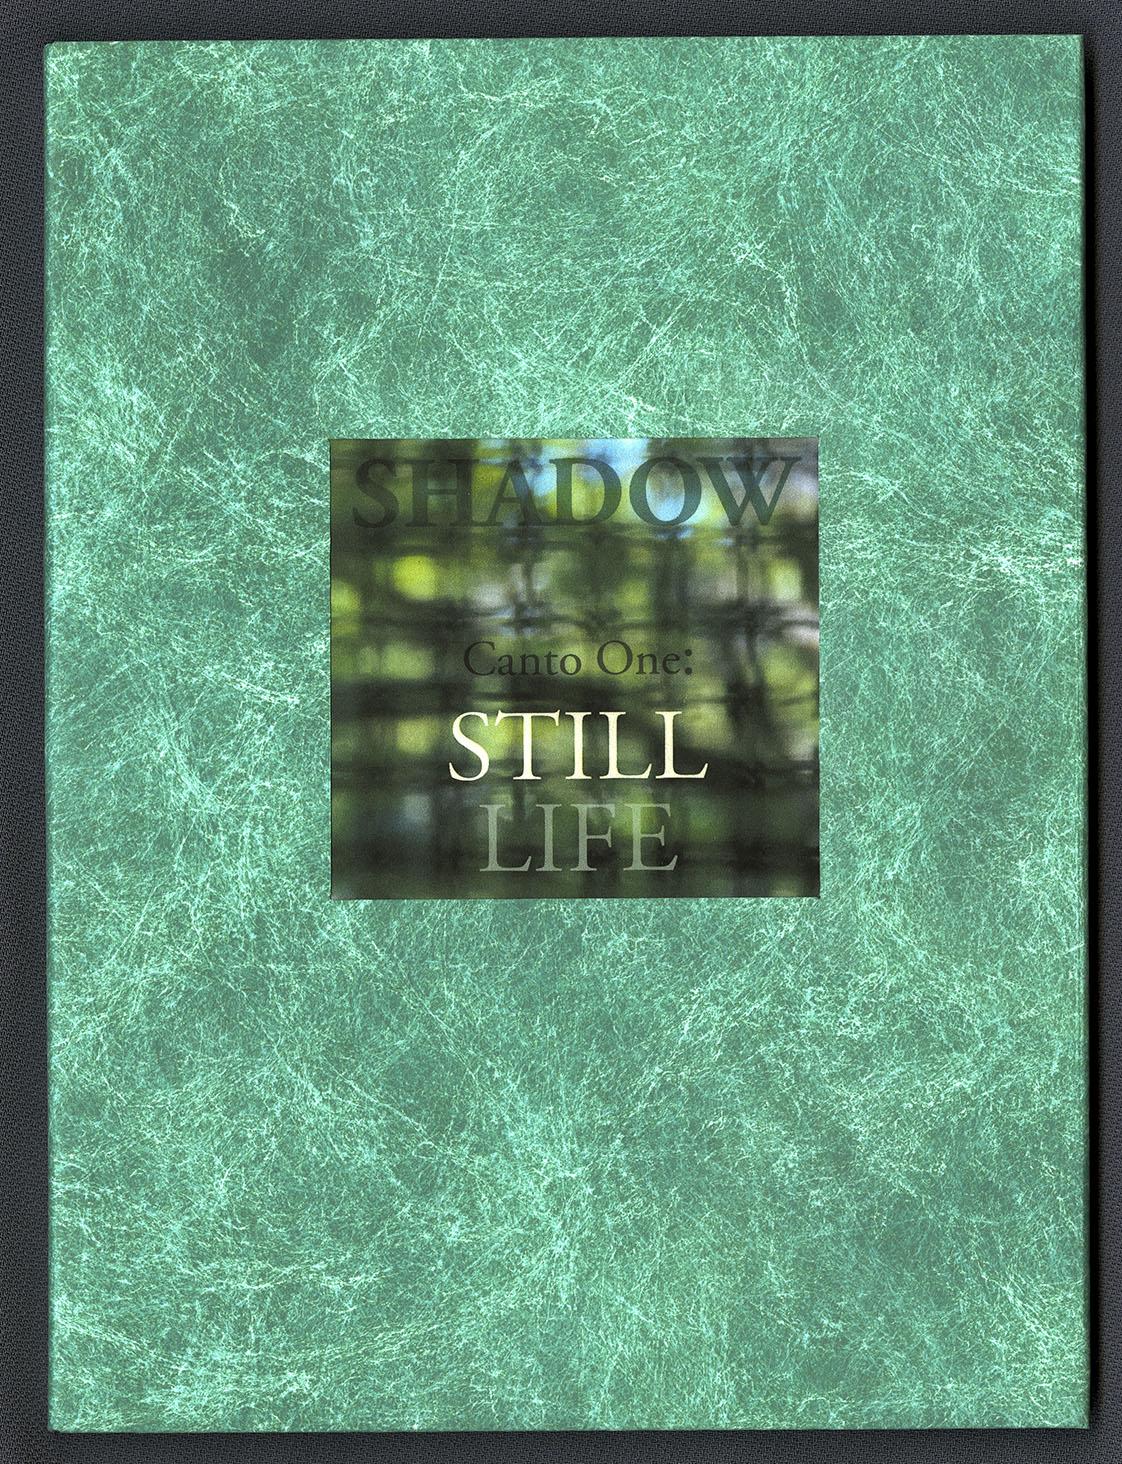 01ShadowStillLifeSlipcase